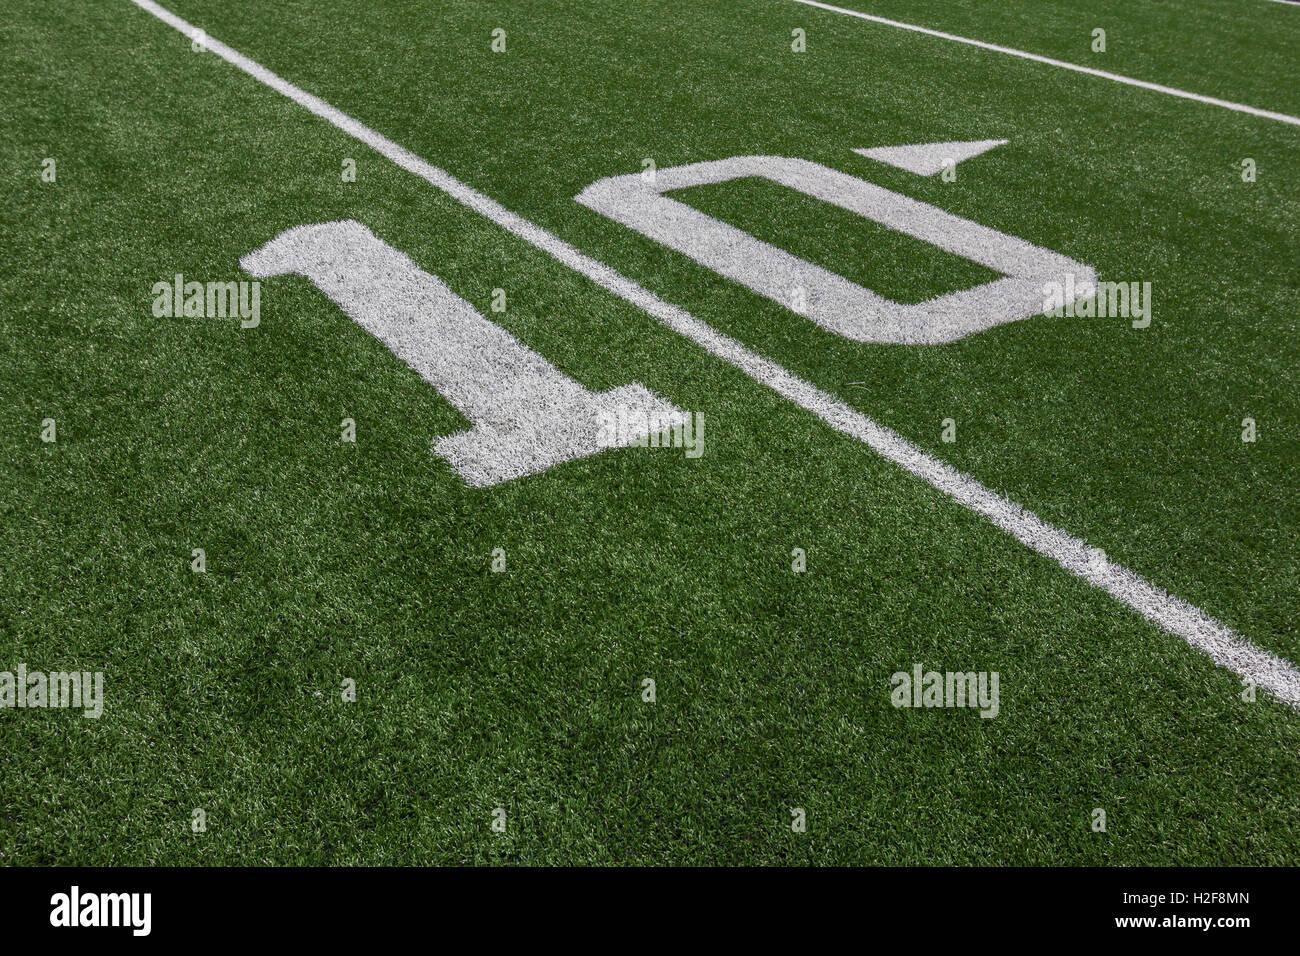 Yardage Markers On A Football Field Stock Photo 122038021 Alamy